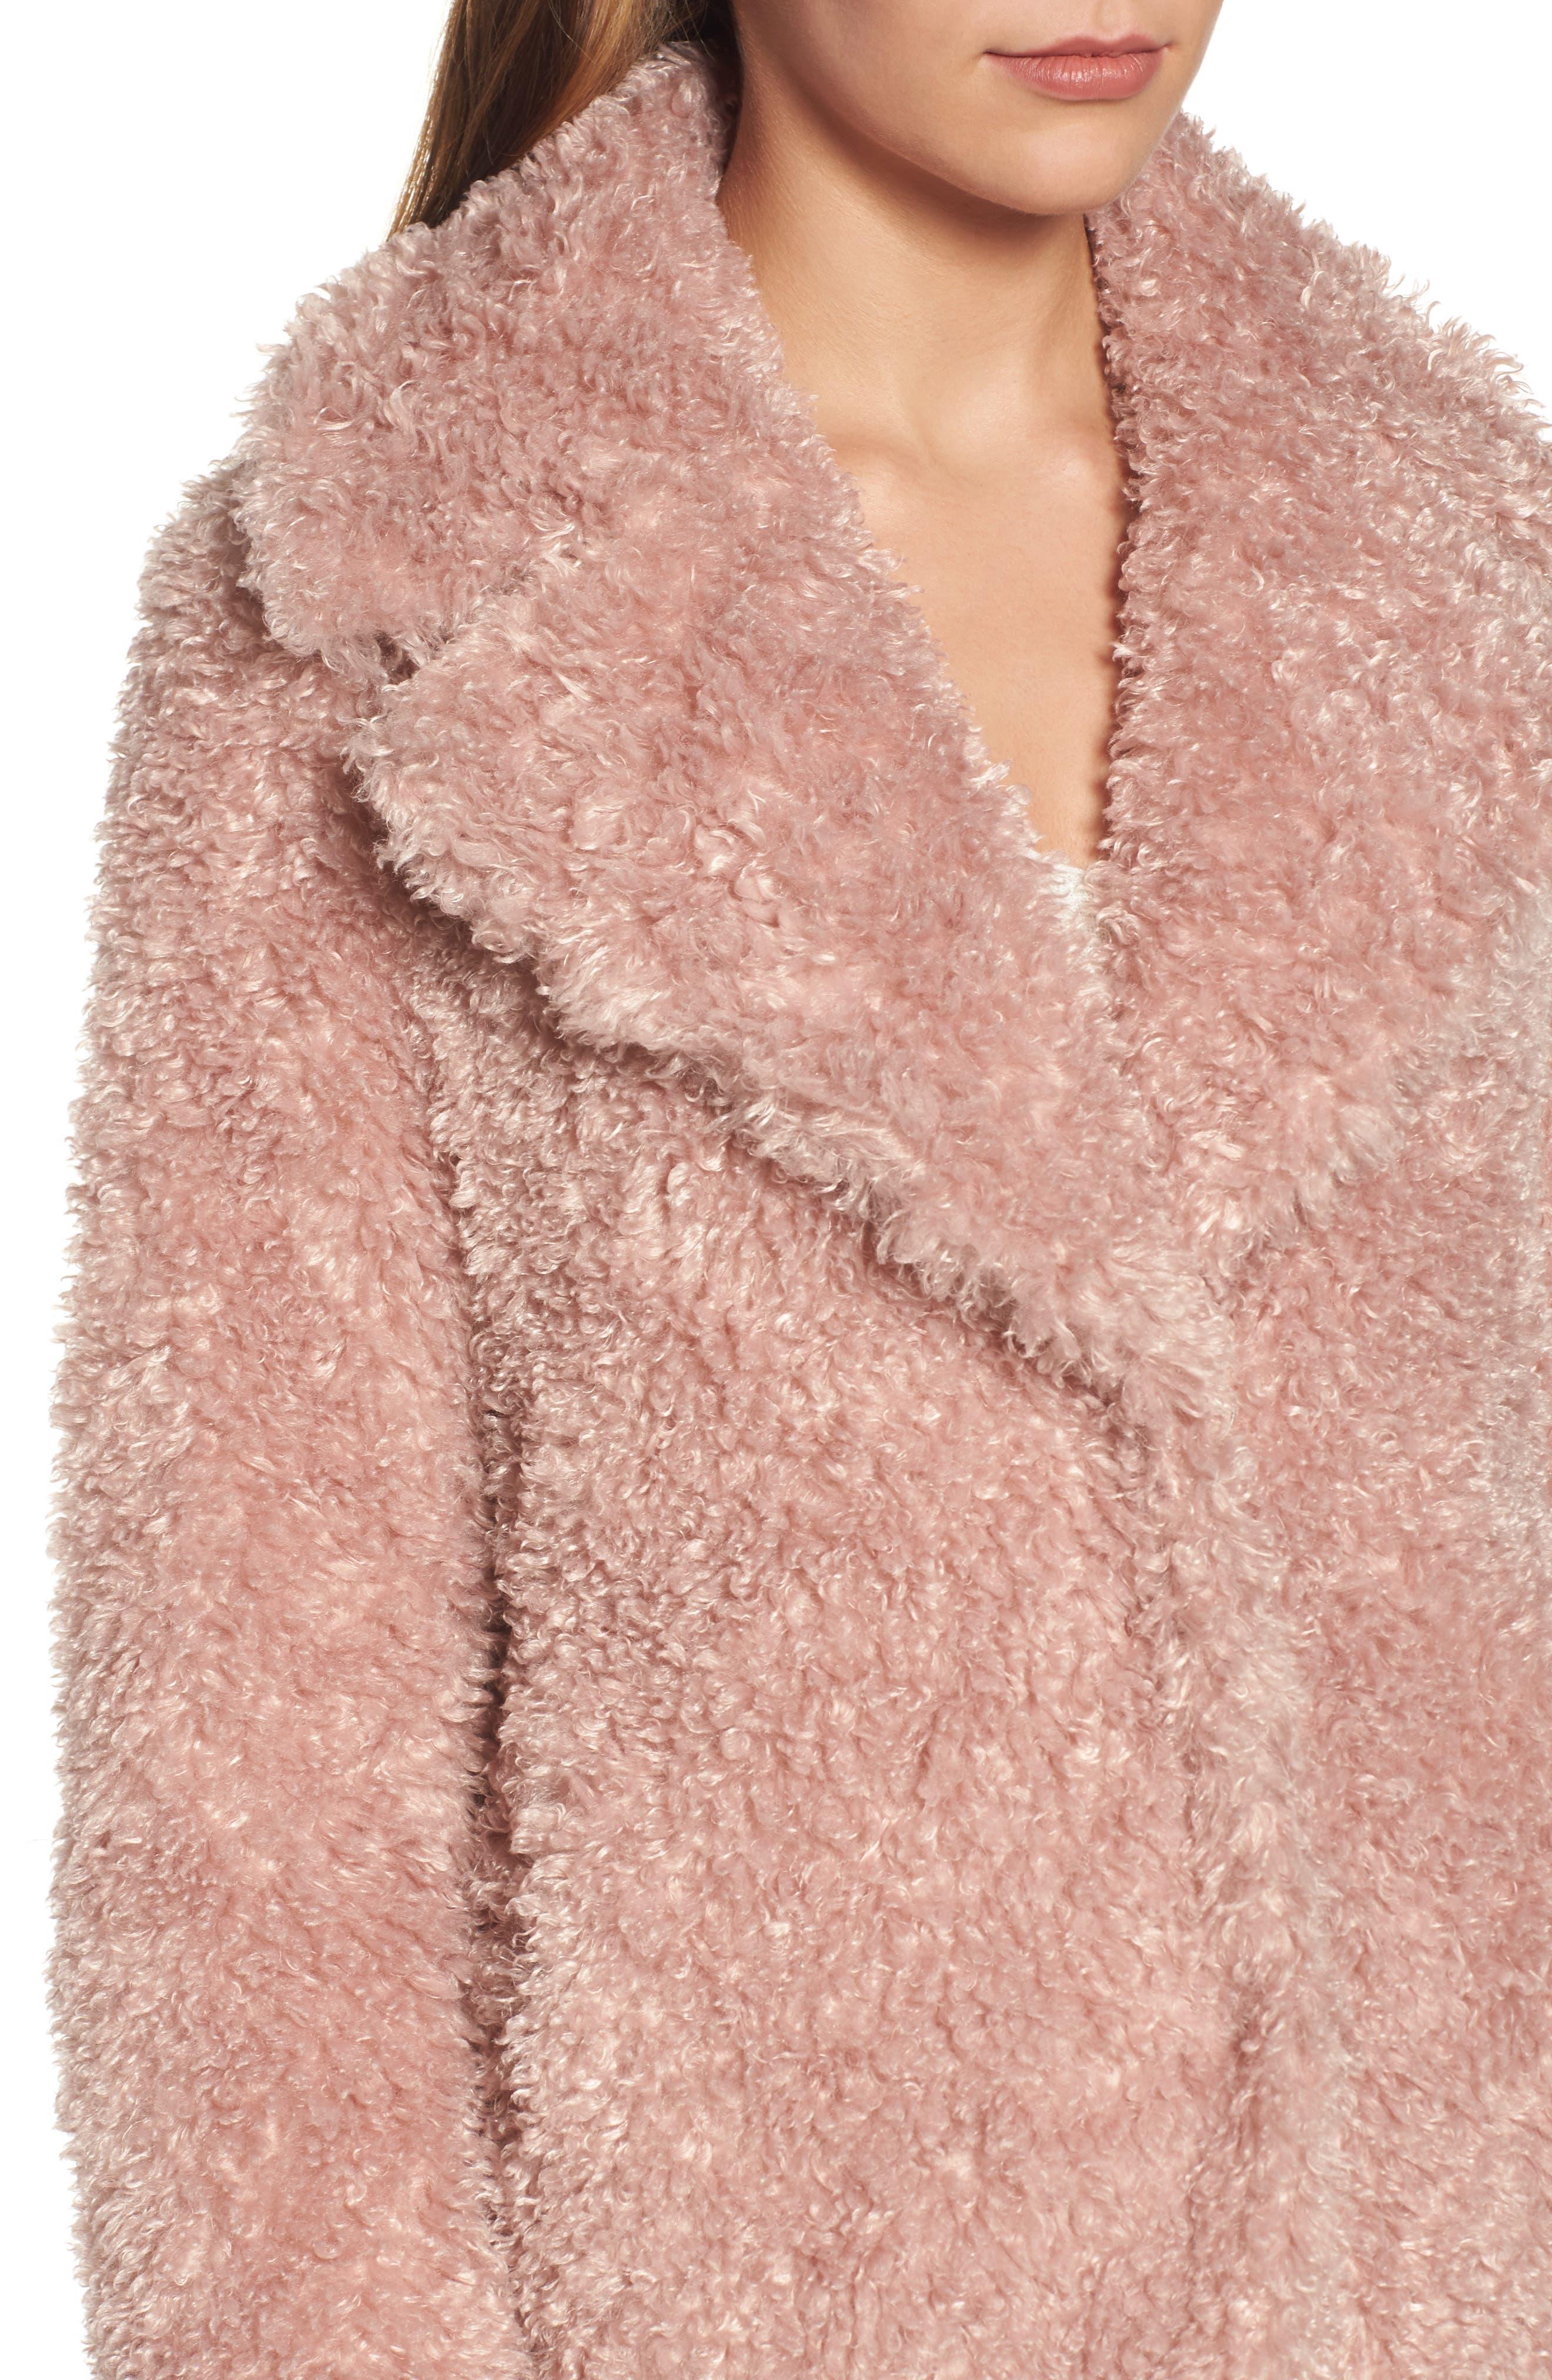 'Teddy Bear' Notch Collar Reversible Faux Fur Coat,                             Alternate thumbnail 19, color,